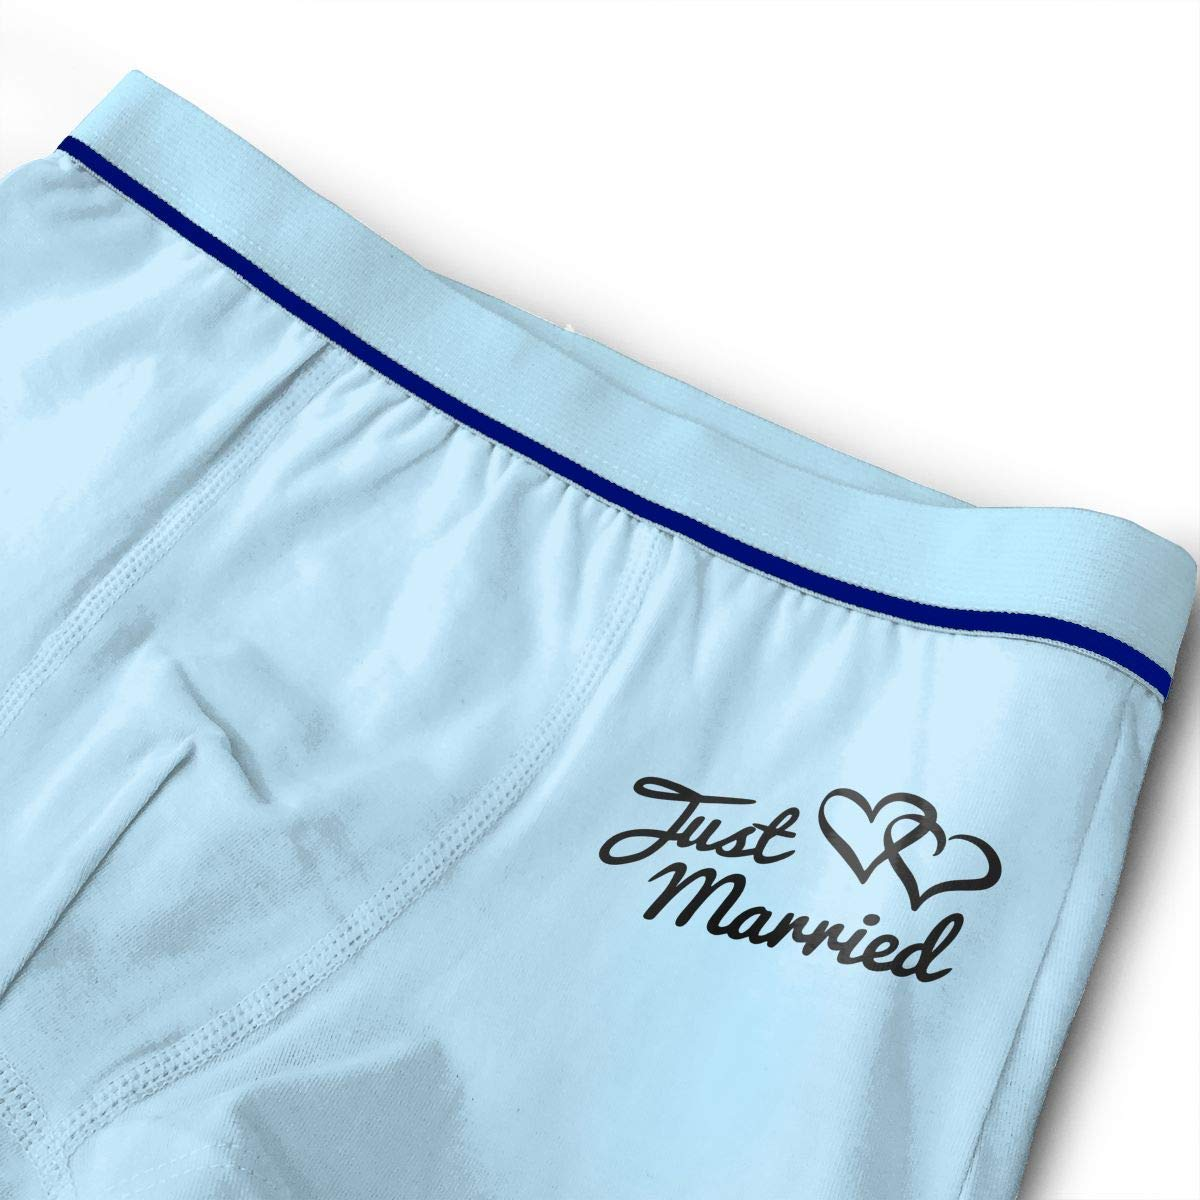 Raingningsning Just Married Teenage Cotton Boxer Briefs Underwear